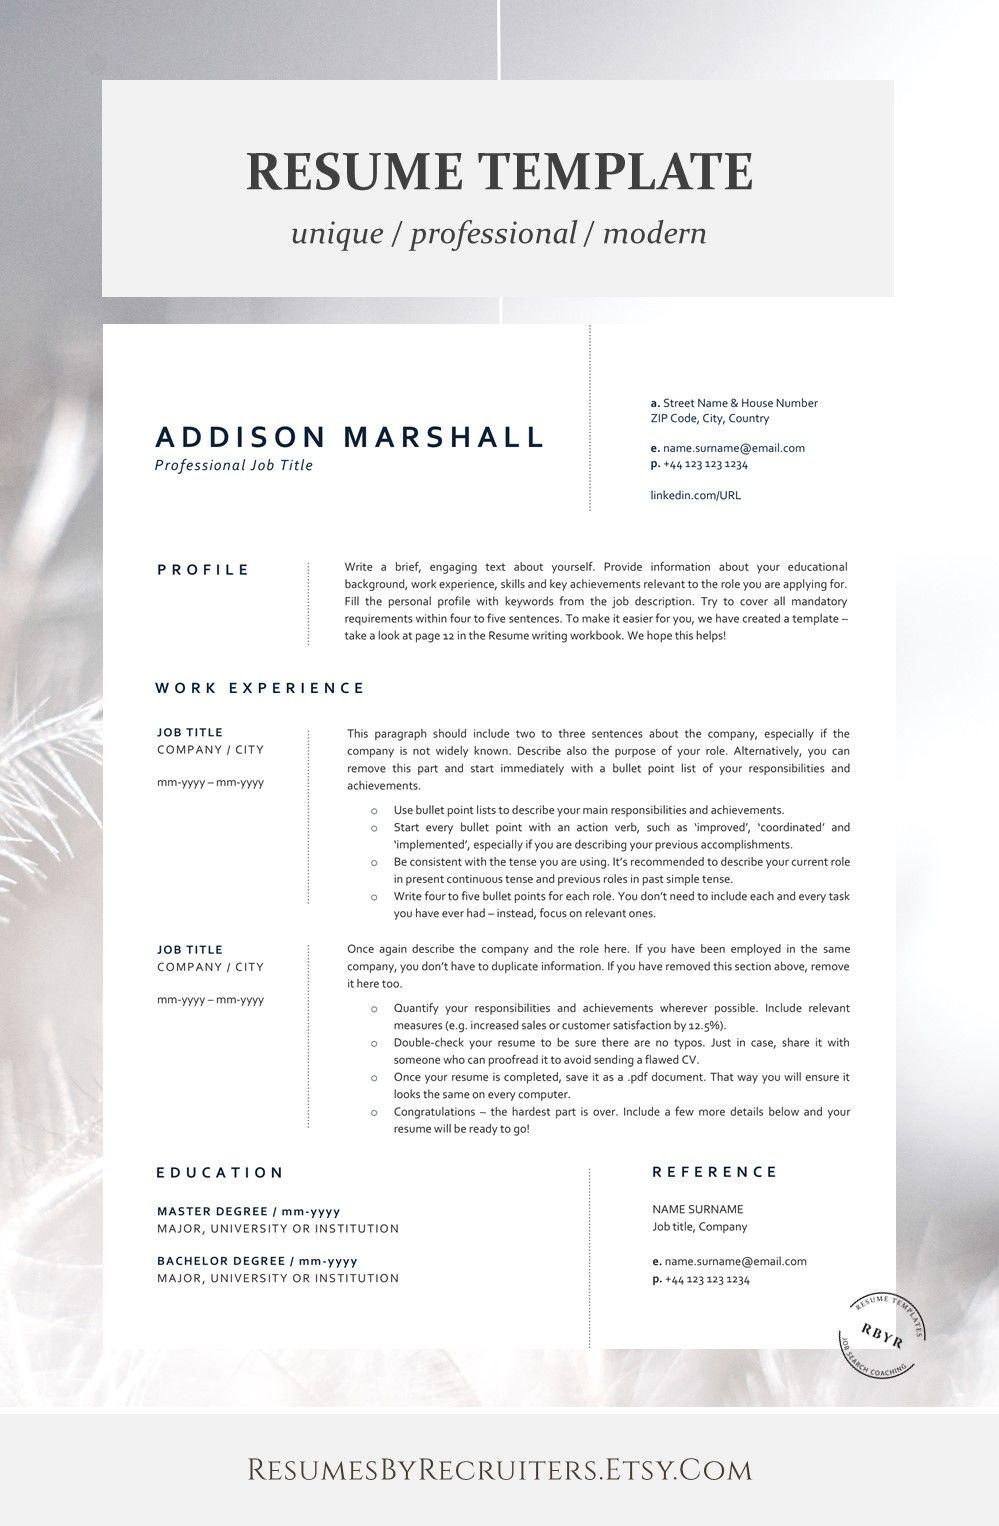 Minimalist Cv Resume Template Instant Download One Page And Etsy Resume Template Minimalist Resume Template Cv Resume Template